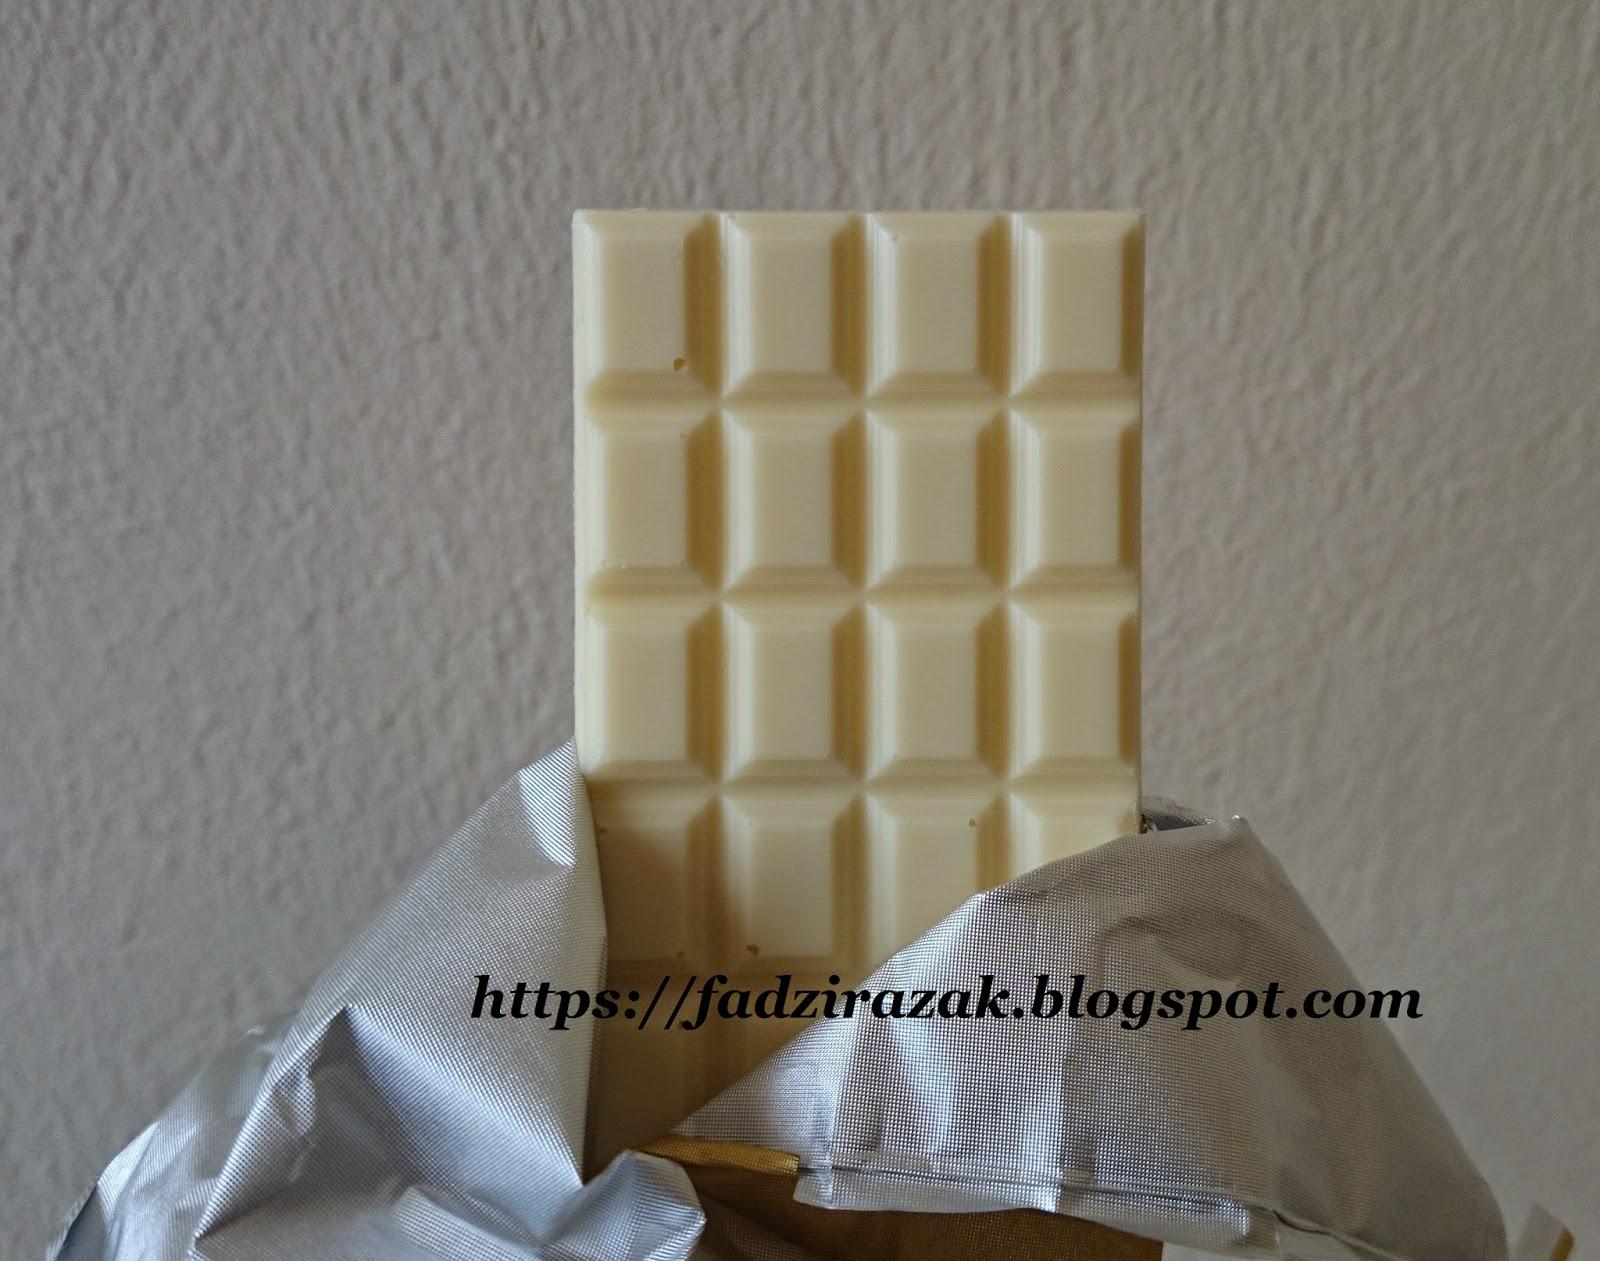 White Chocolate Maison Dlights